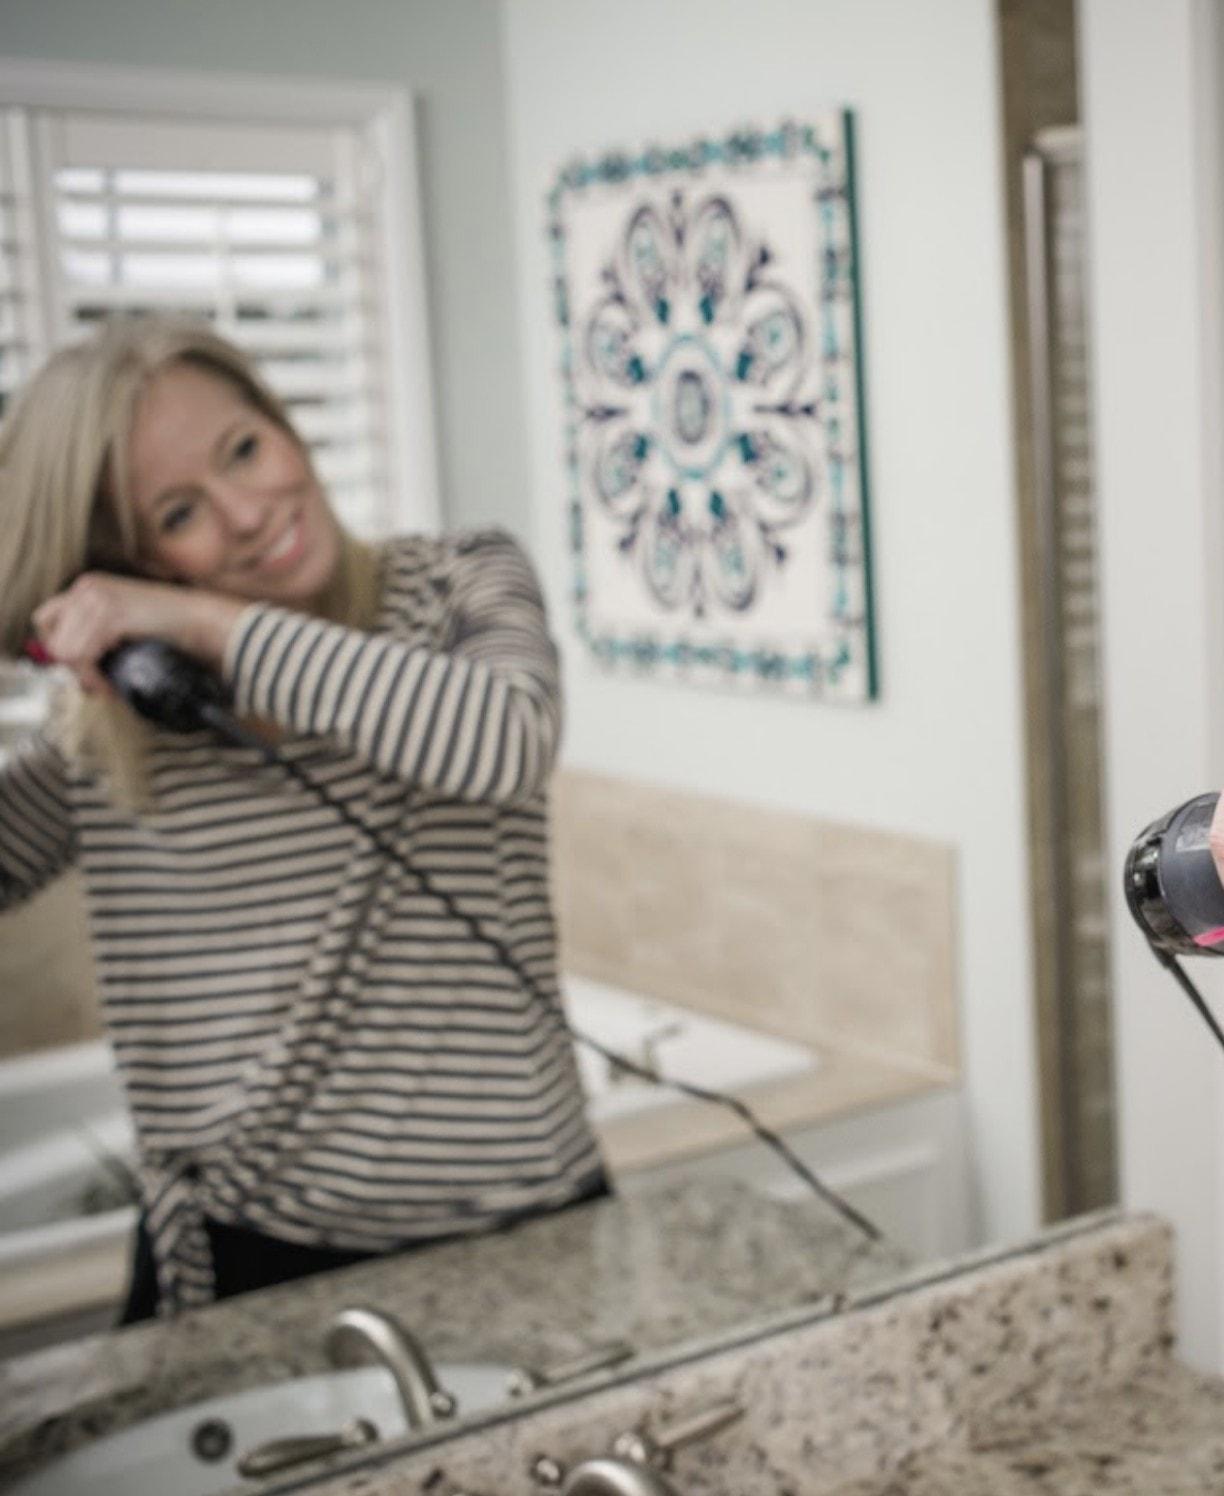 fixing hair in mirror